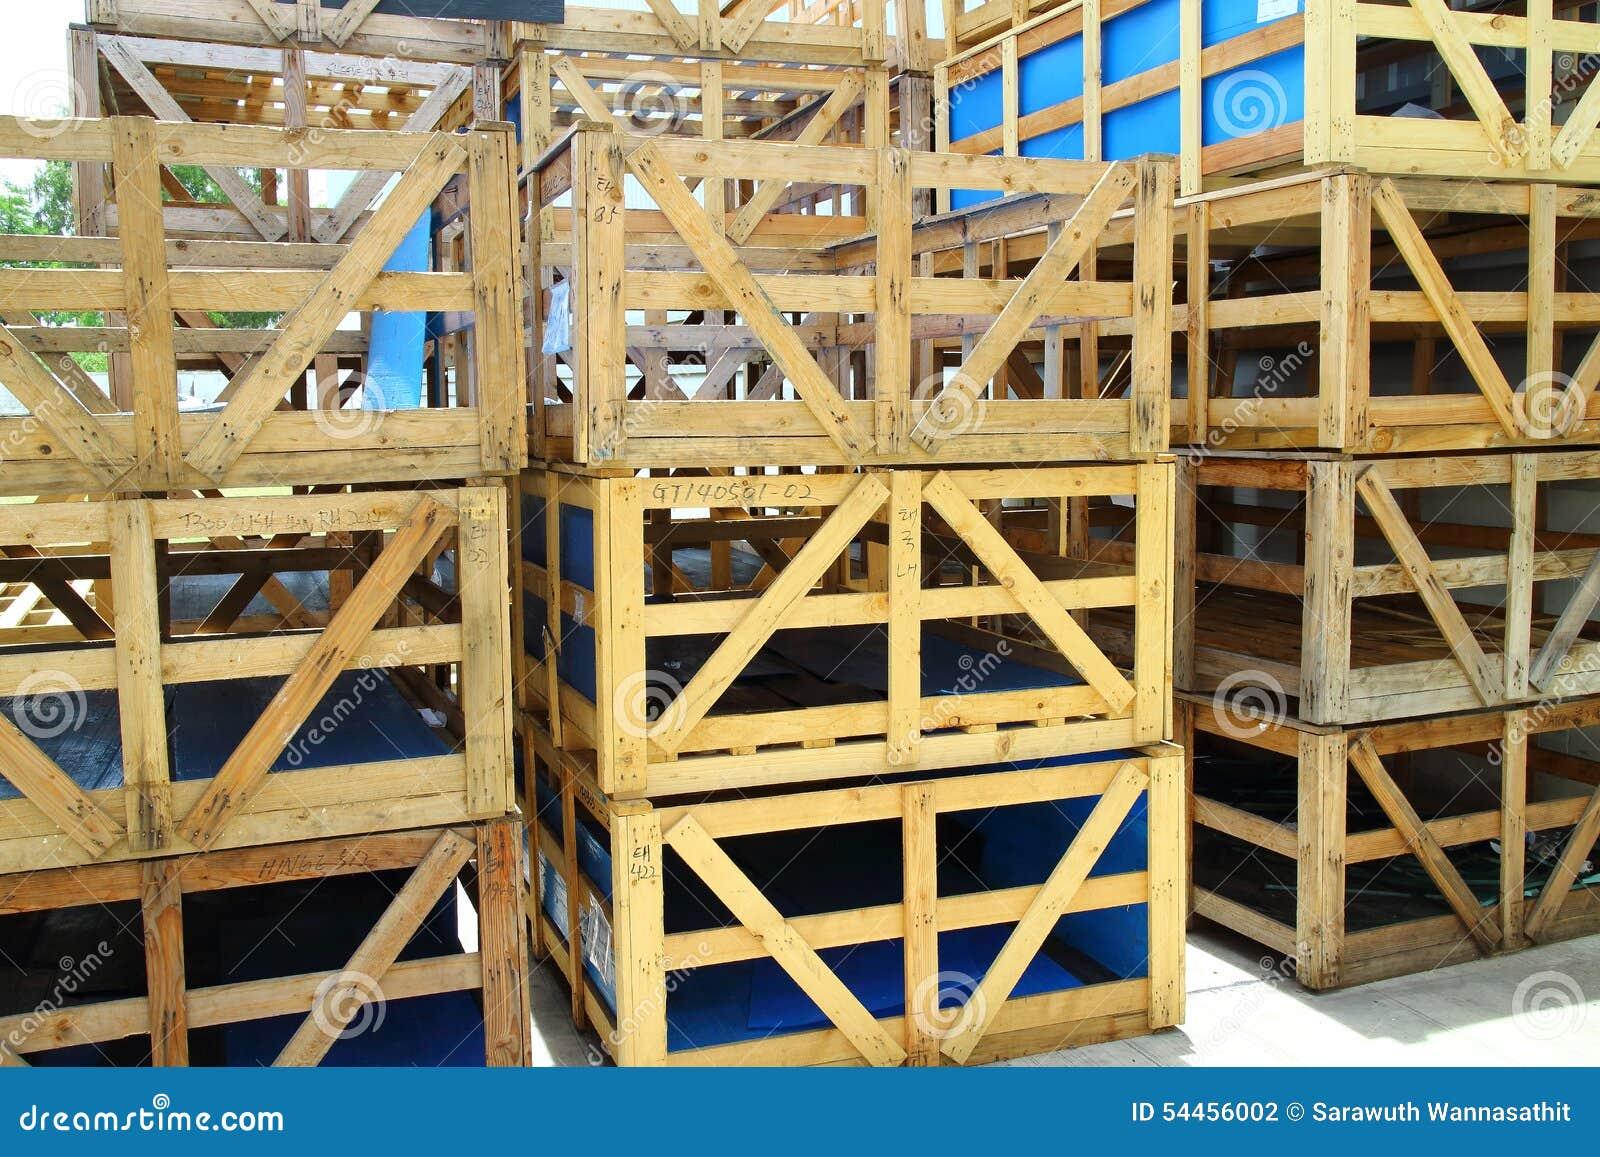 Wood Pallet Box Stock Photo - Image: 54456002